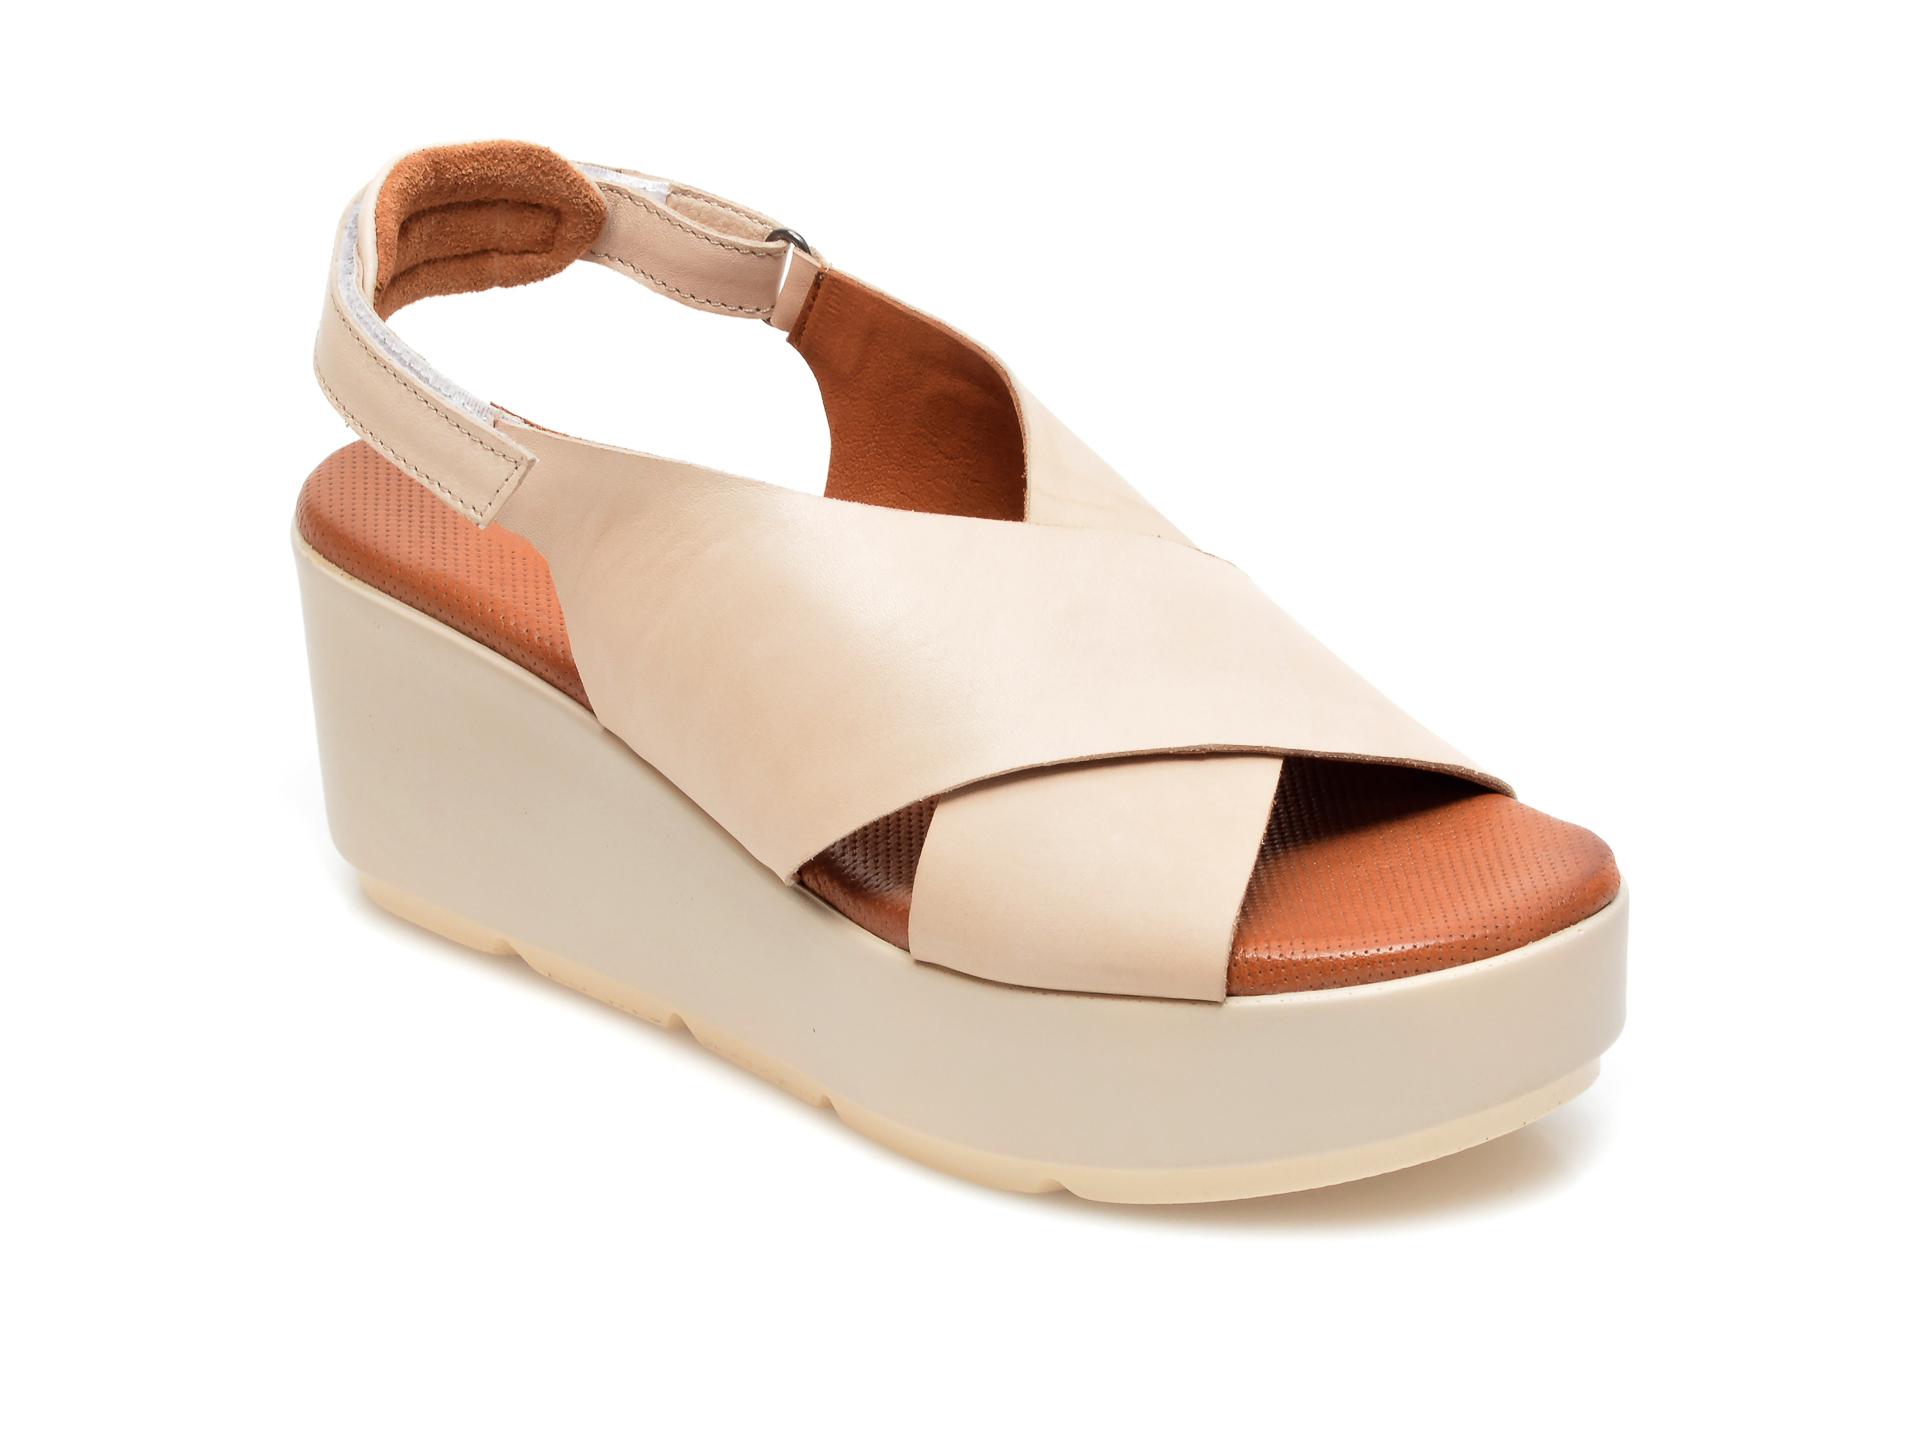 Sandale BABOOS bej, 2520, din piele naturala imagine otter.ro